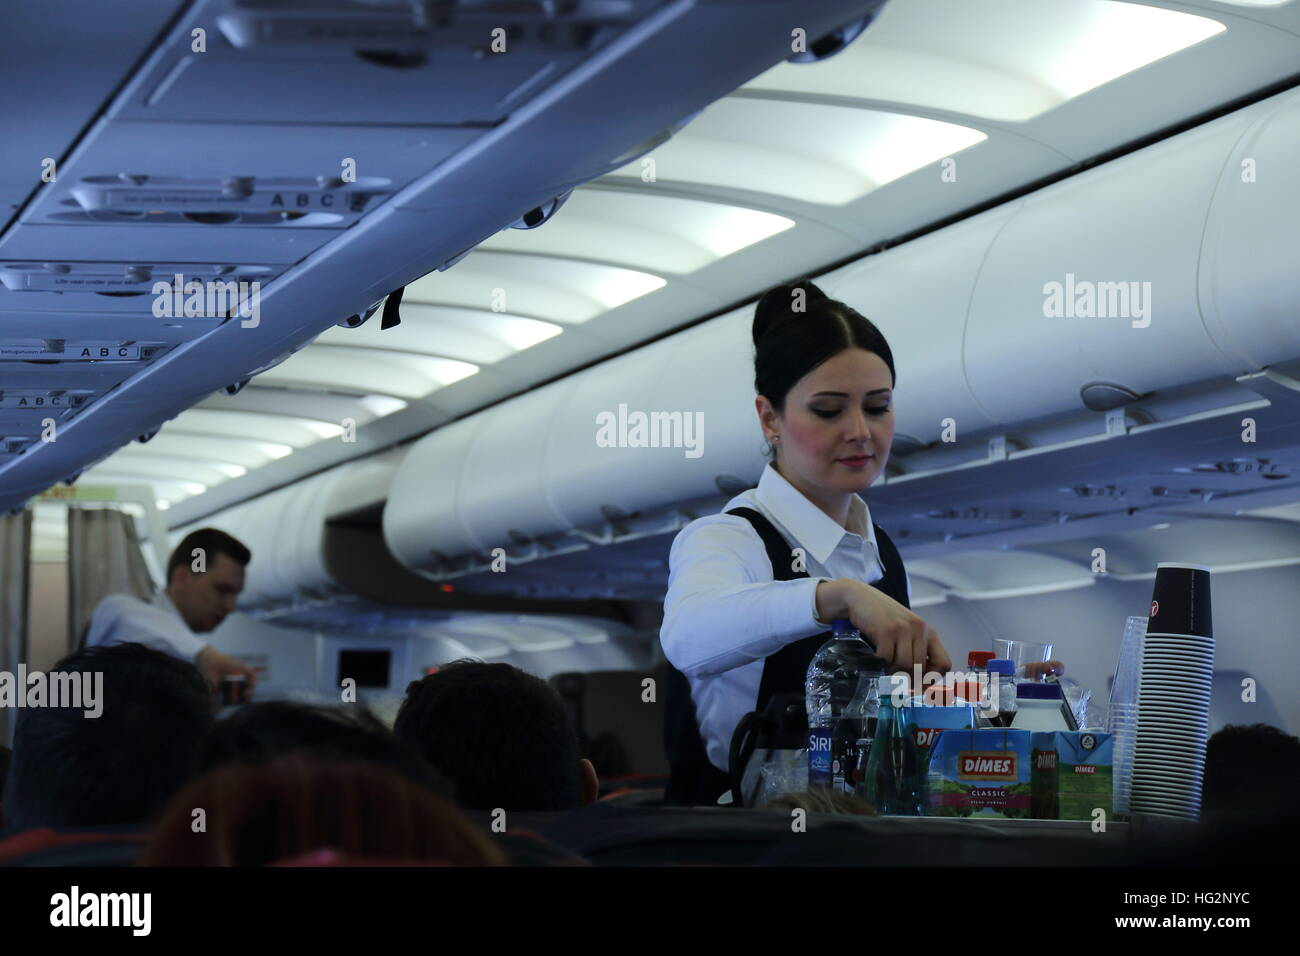 Cabin crew on passenger aircraft - Stock Image